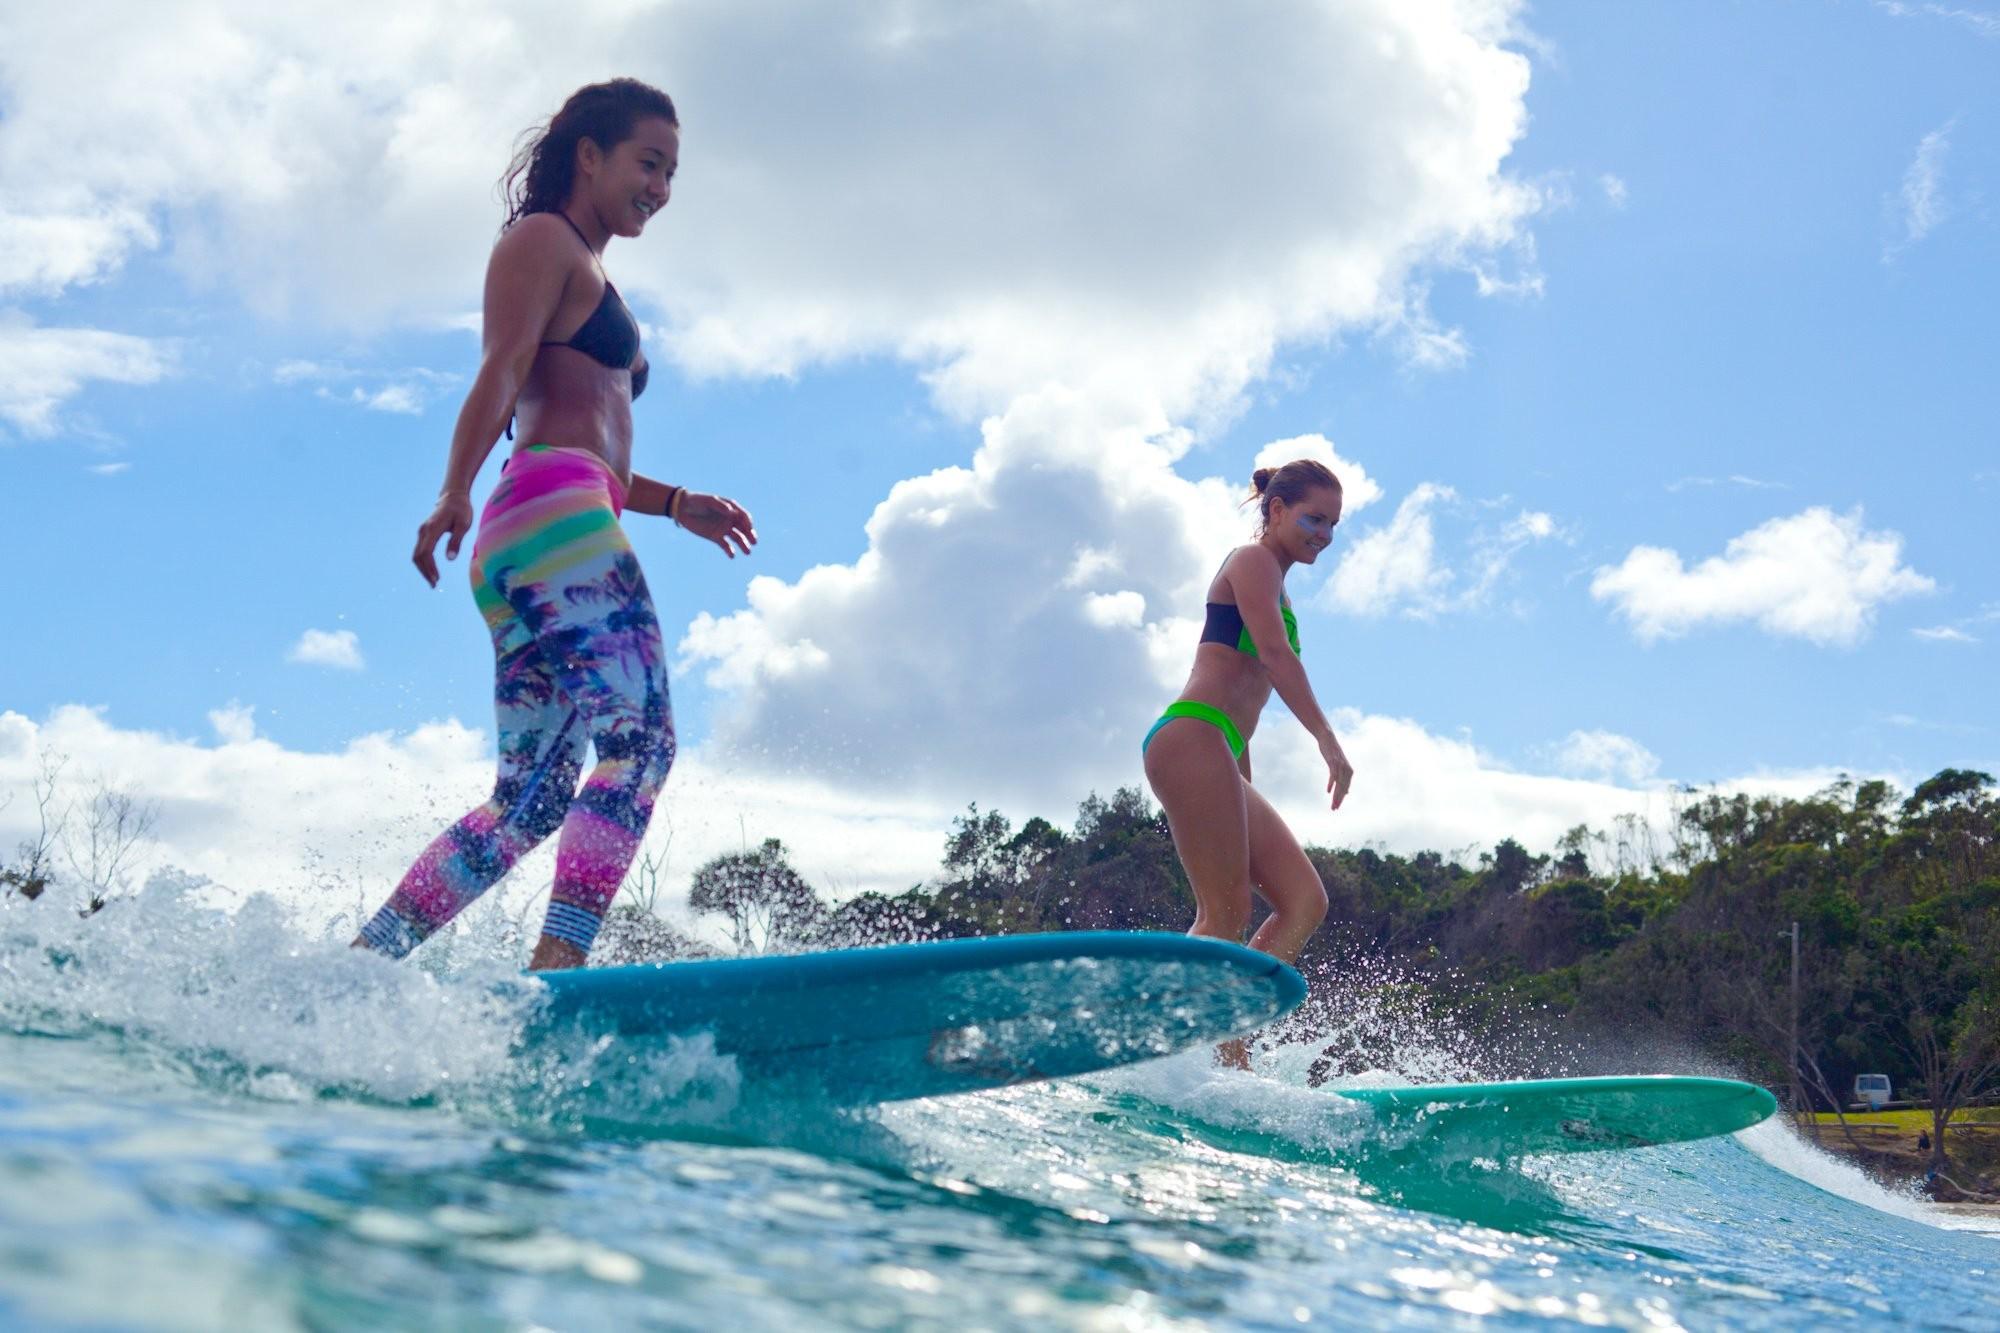 Surfing surf ocean sea waves extreme surfer (23) wallpaper | |  332391 | WallpaperUP